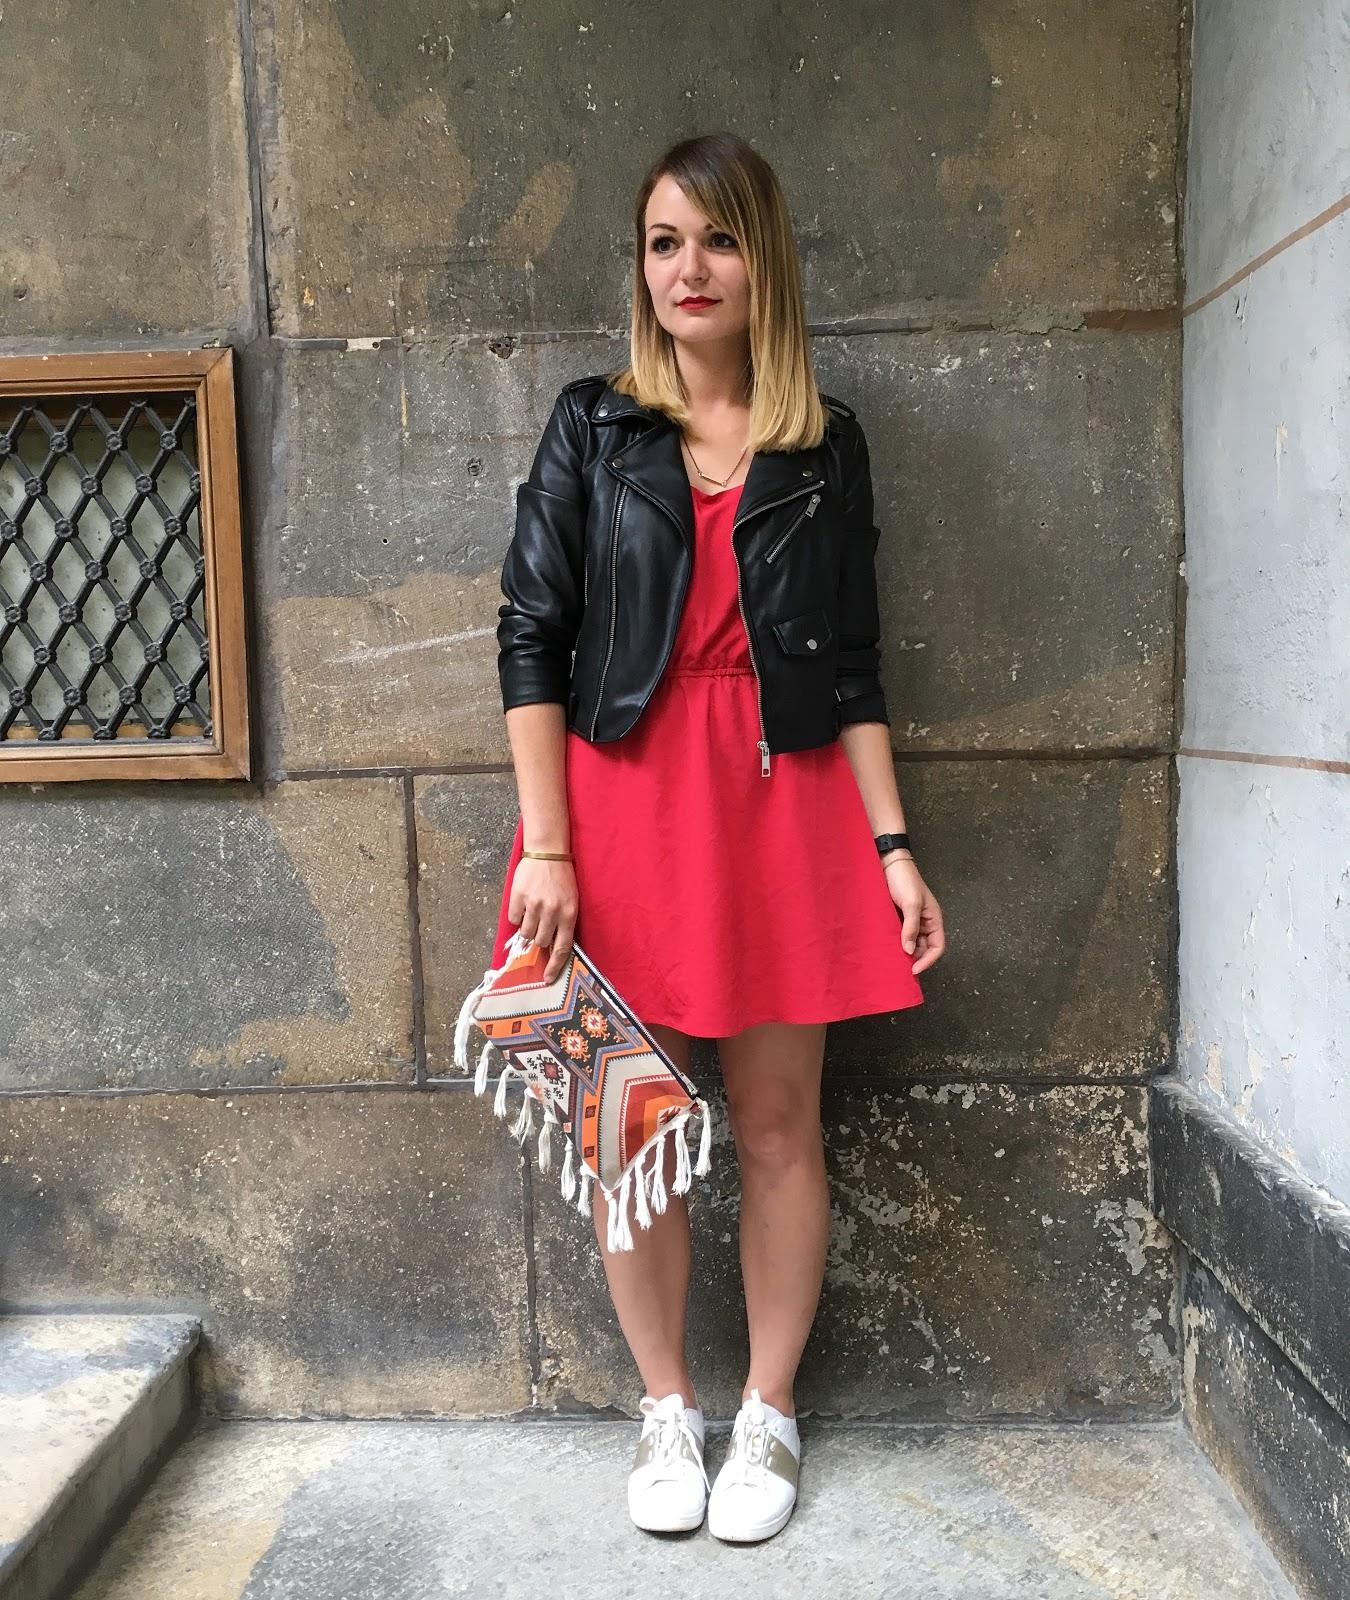 la petite robe rouge pauline dress blog mode lifestyle et d co besan on. Black Bedroom Furniture Sets. Home Design Ideas